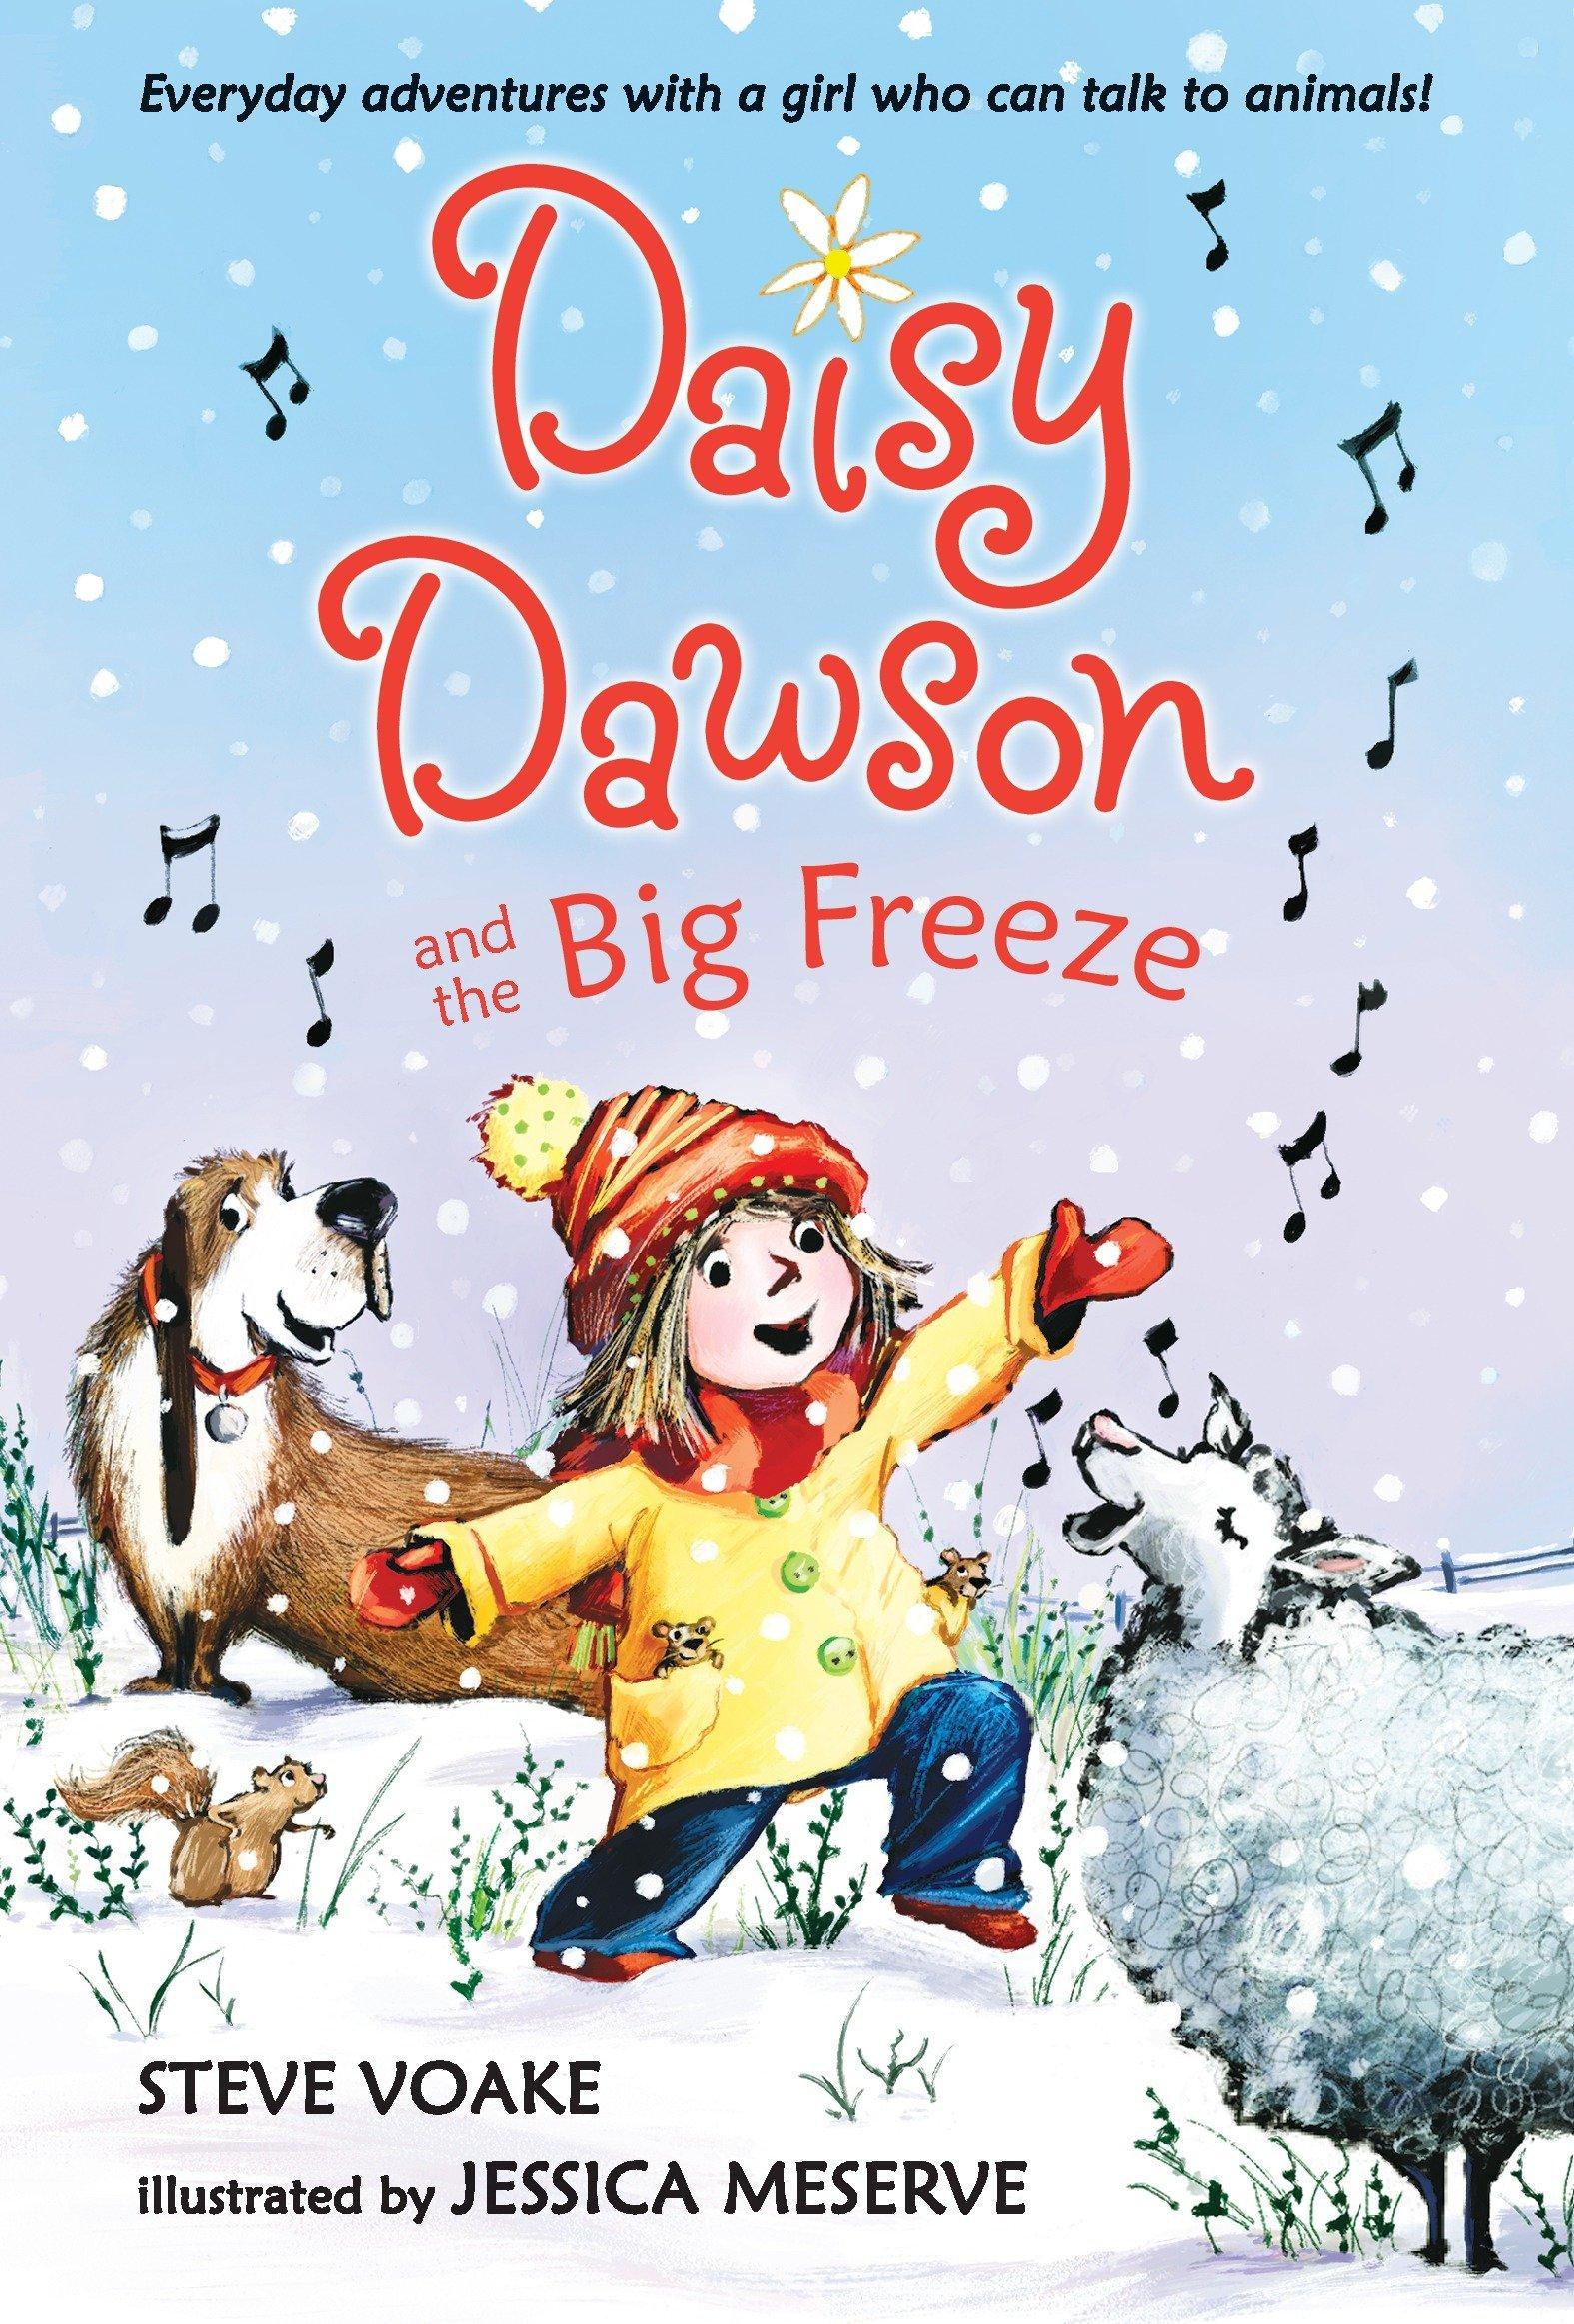 Amazon.com: Daisy Dawson and the Big Freeze (9780763656270): Steve Voake,  Jessica Meserve: Books